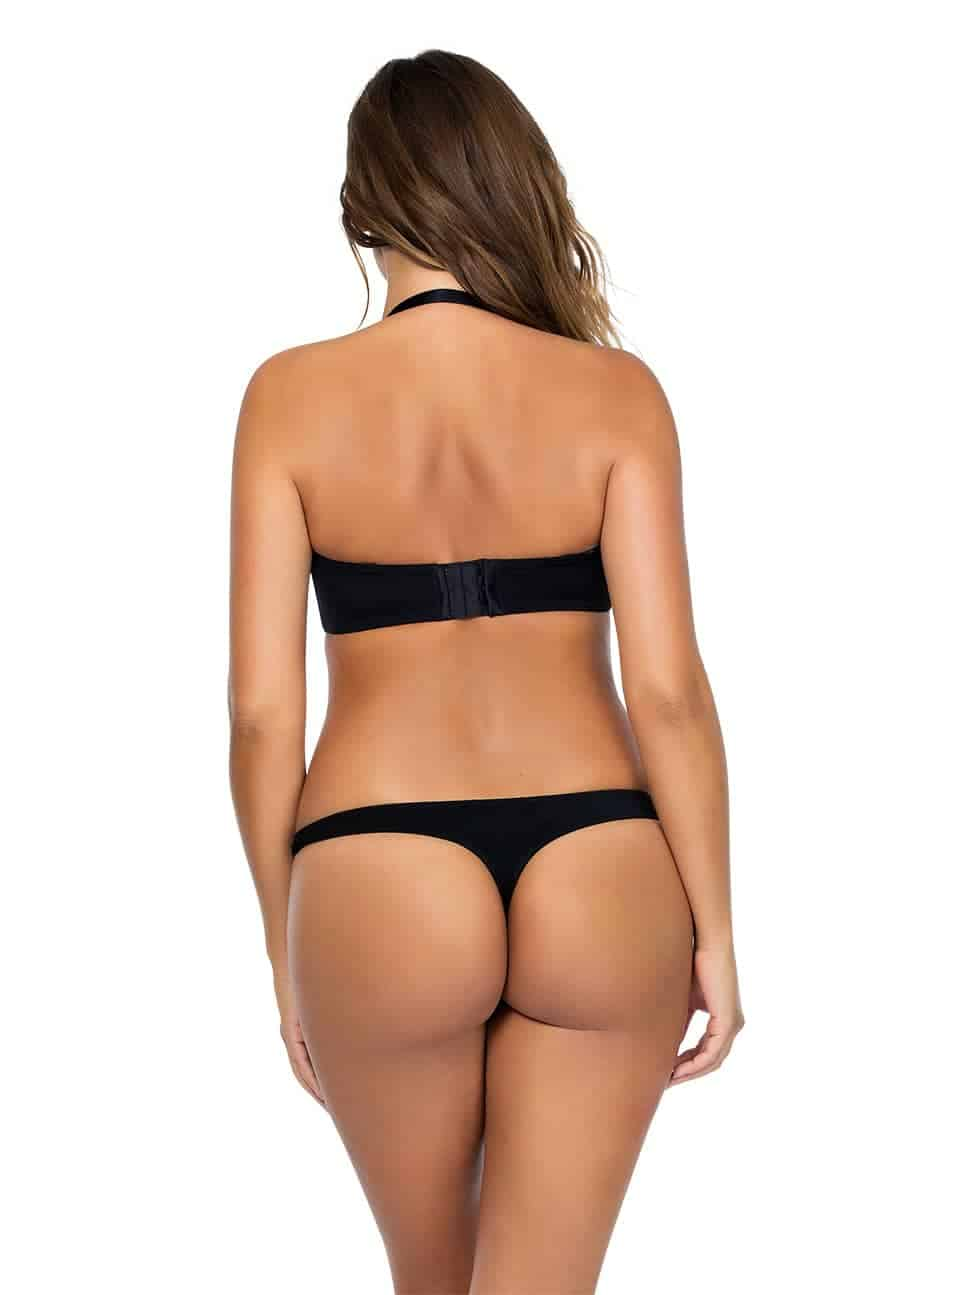 Jeanie StraplessContourBra4815 Black Halter Back - Jeanie Strapless Contour Bra - Black - 4815